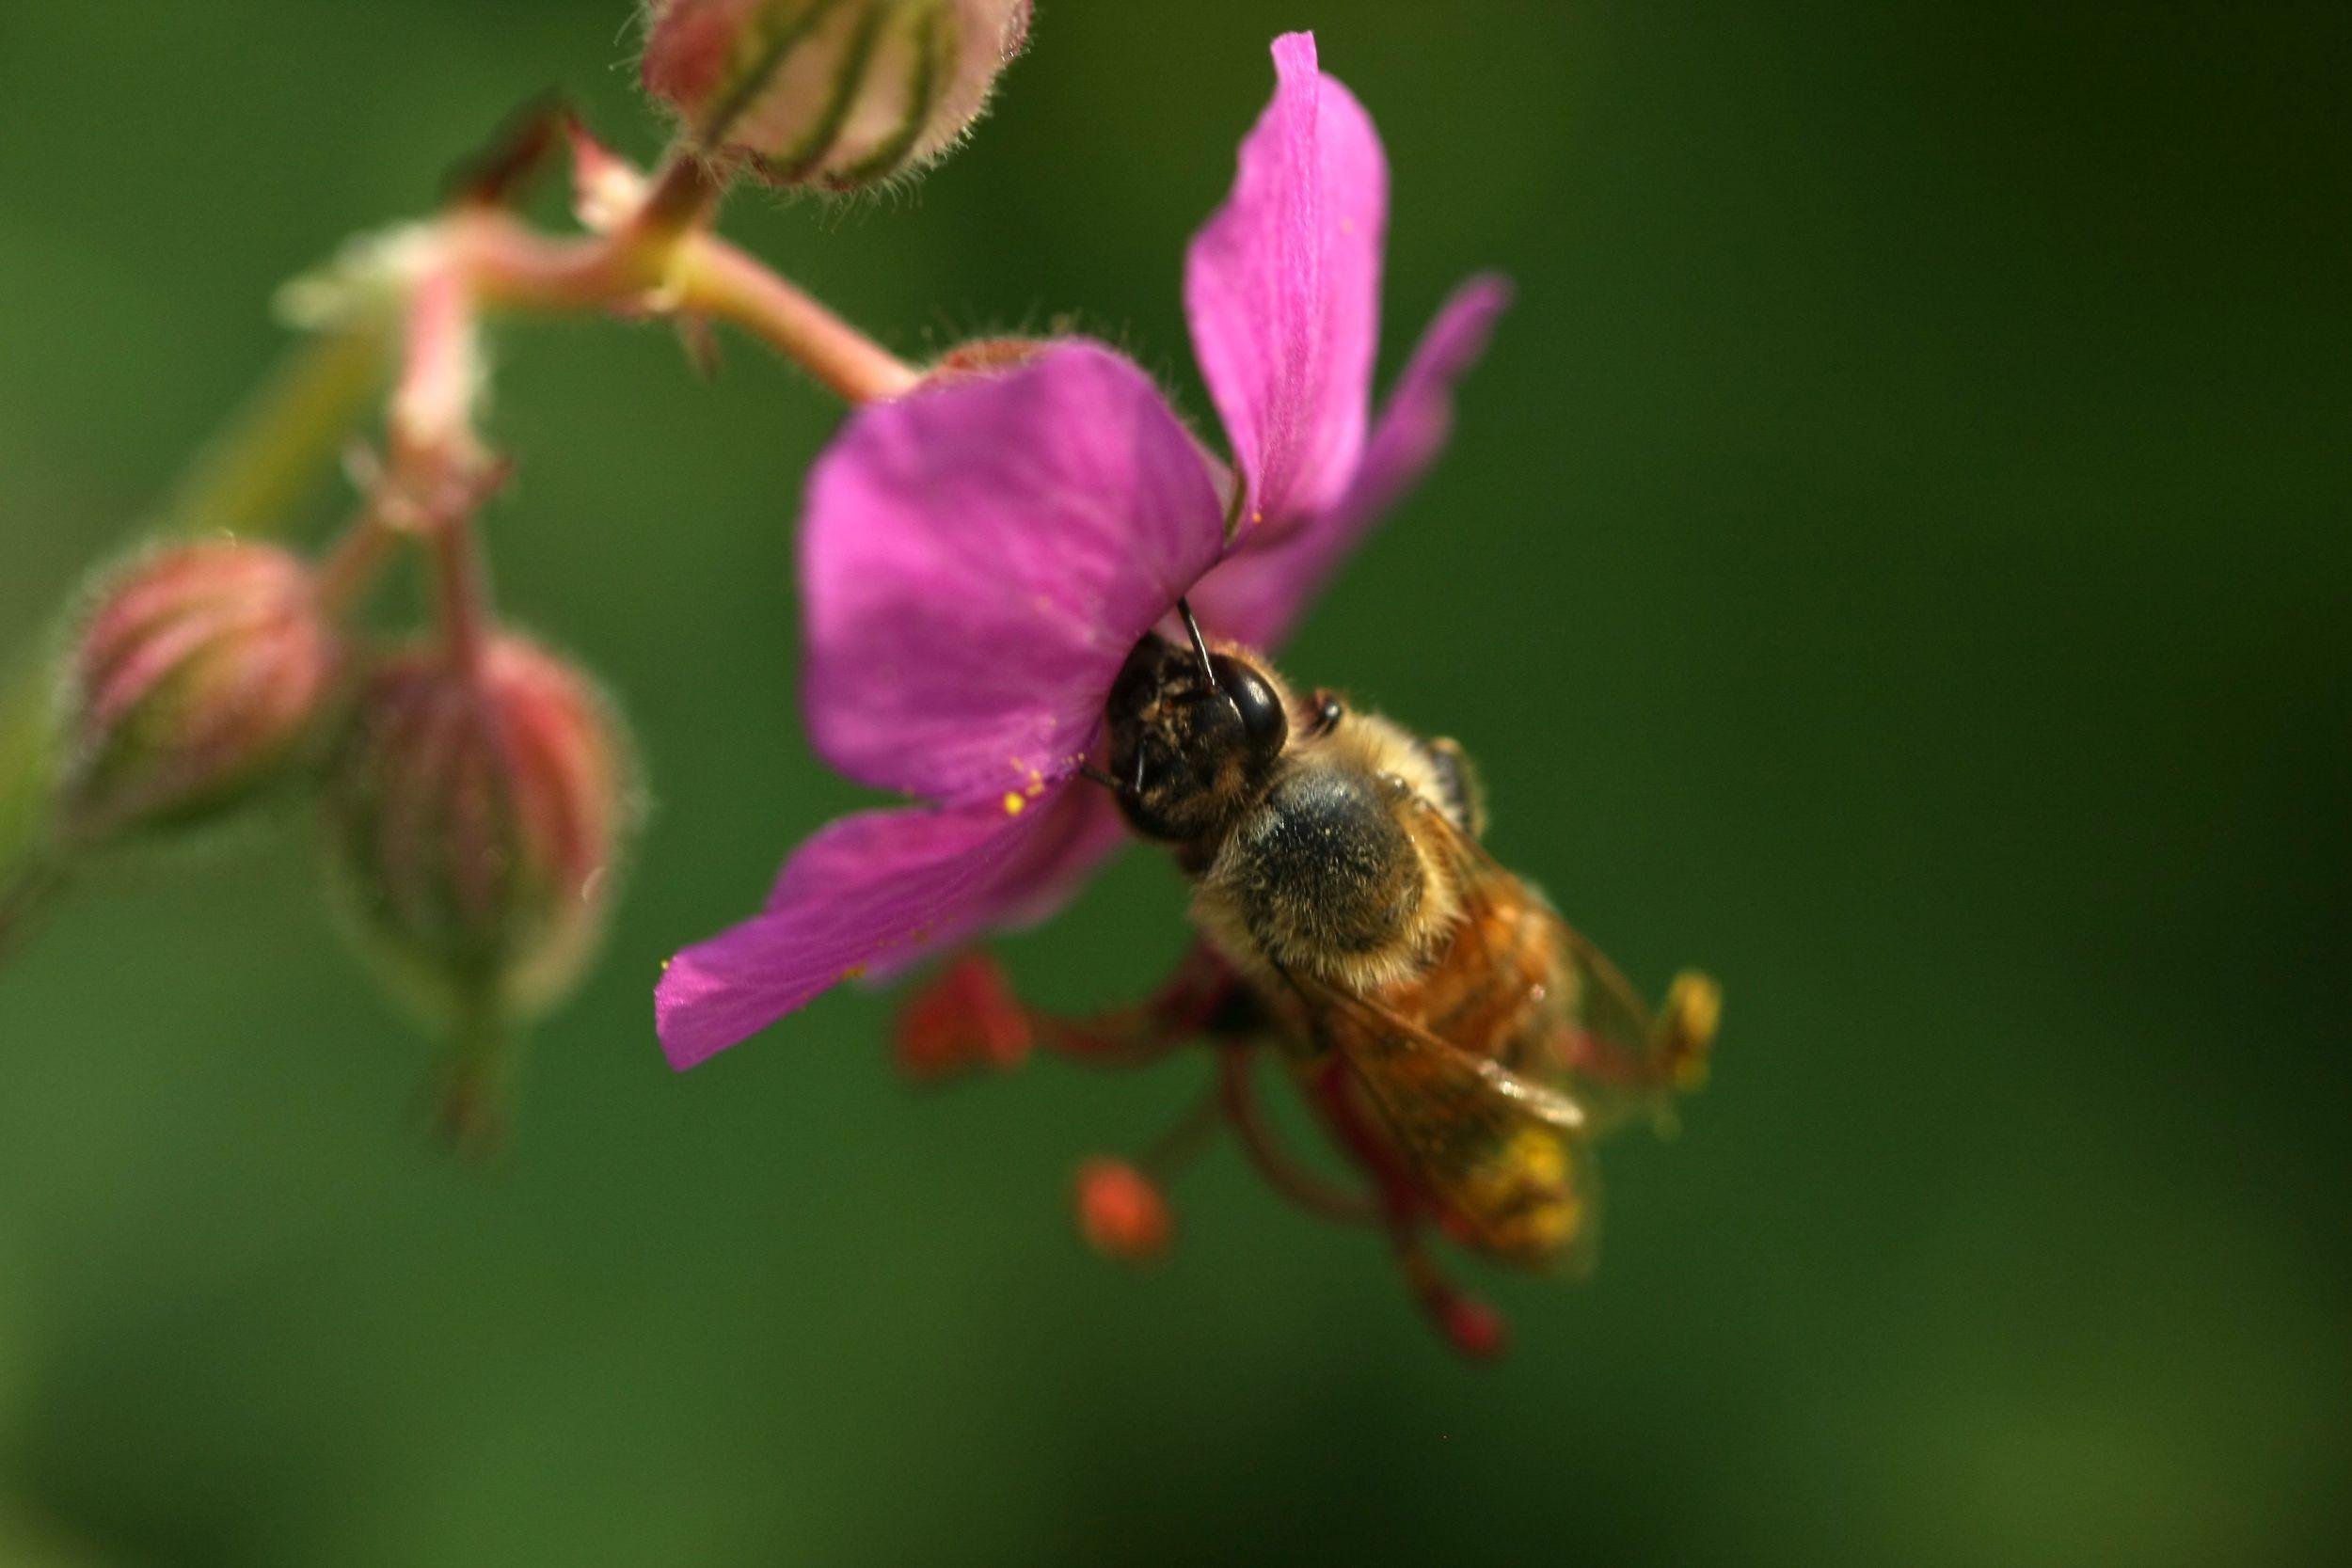 Pollen transport